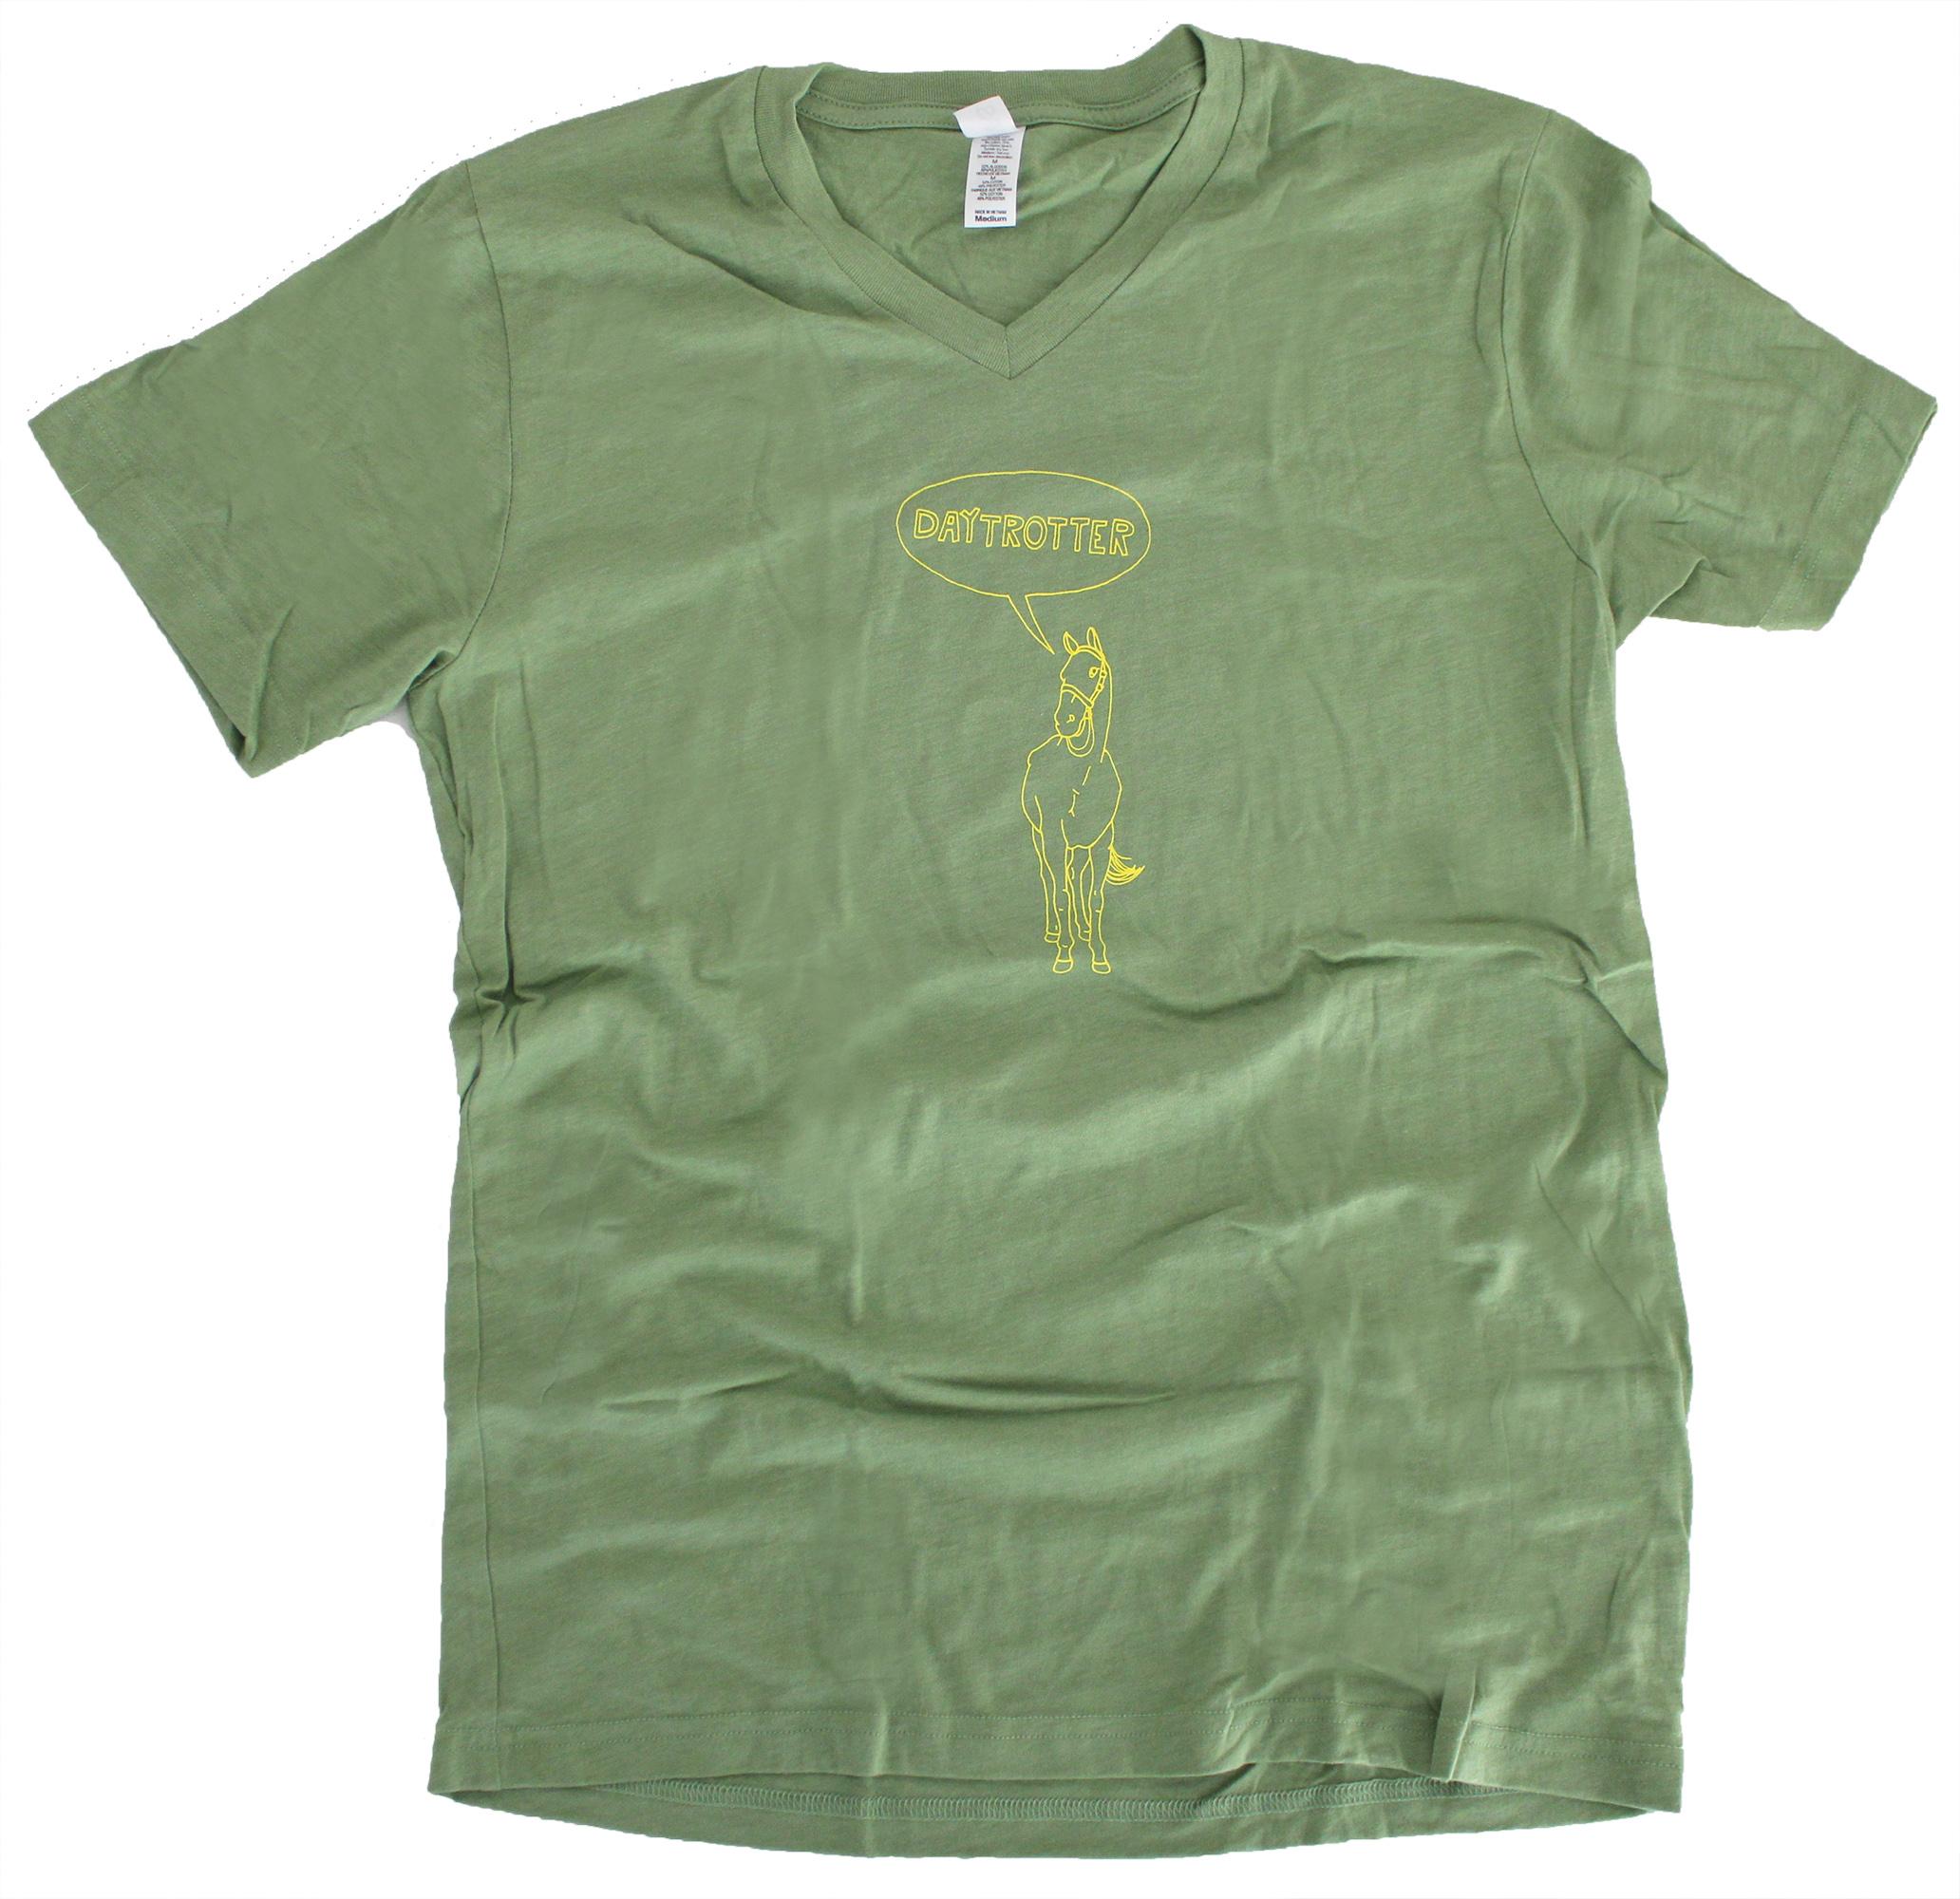 DaytrotterMen's T-Shirt